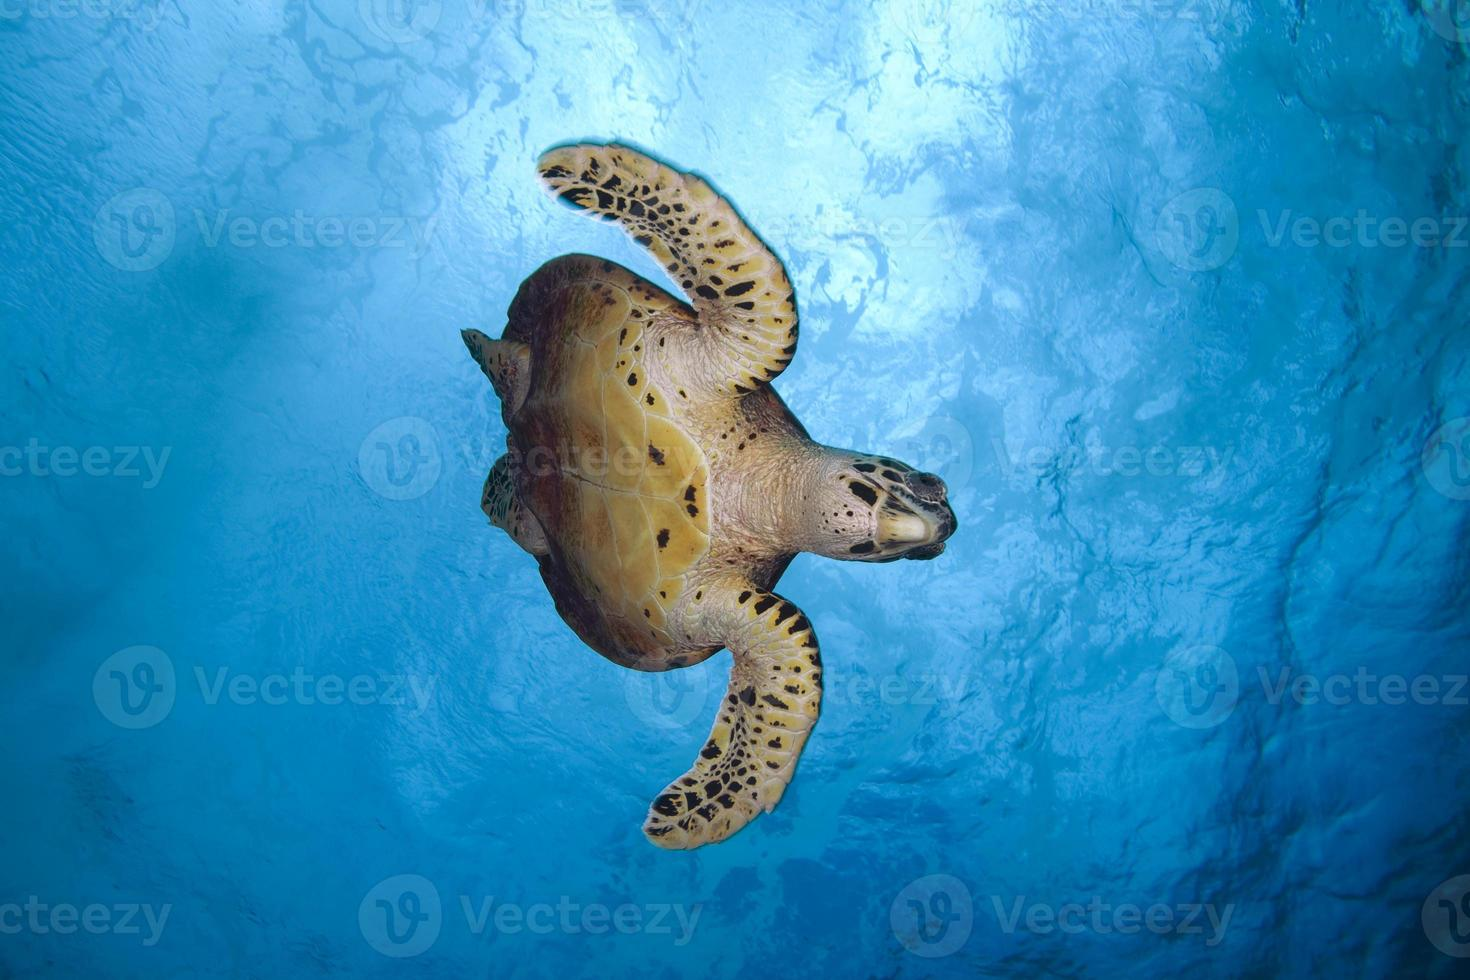 havsköldpadda / sköldpadda ã ã © caille foto